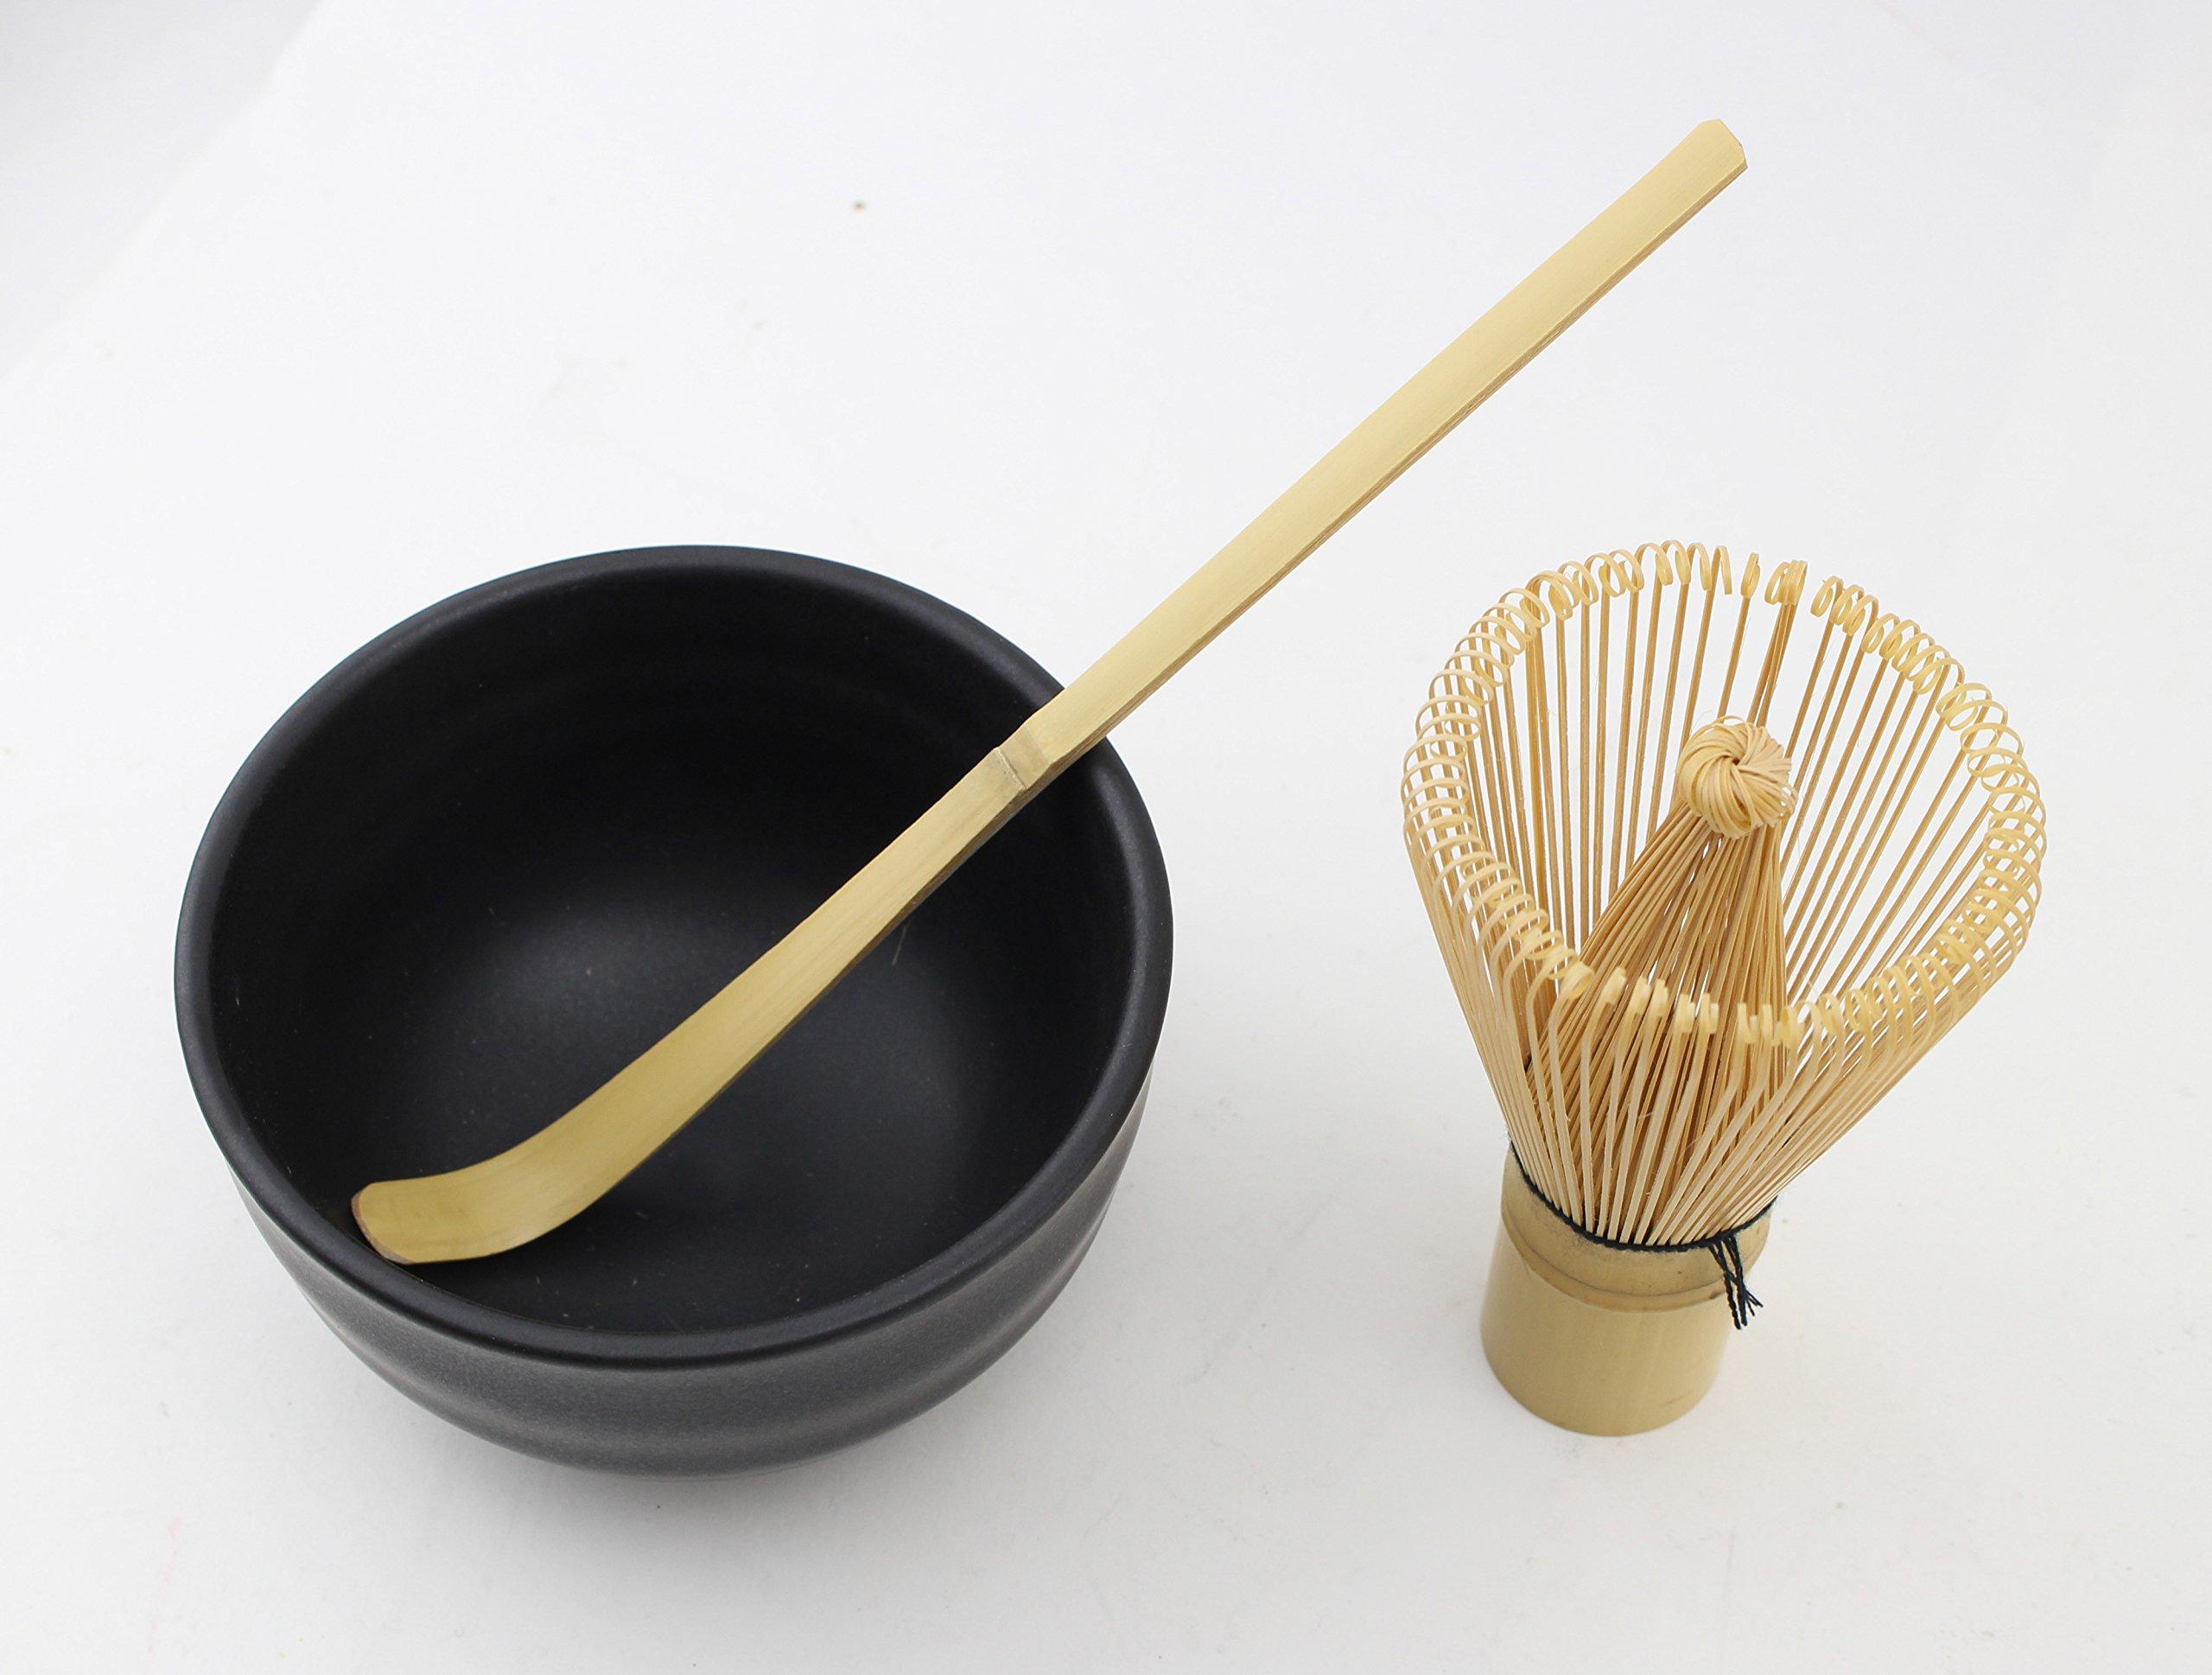 Matcha Whisk Set まっちゃ 抹茶 - Brush + Ceramic Bowl + Scoop / 八十本立 Japanese Green Tea Bamboo Preparing Tool 3 Piece Set by We pay your sales tax